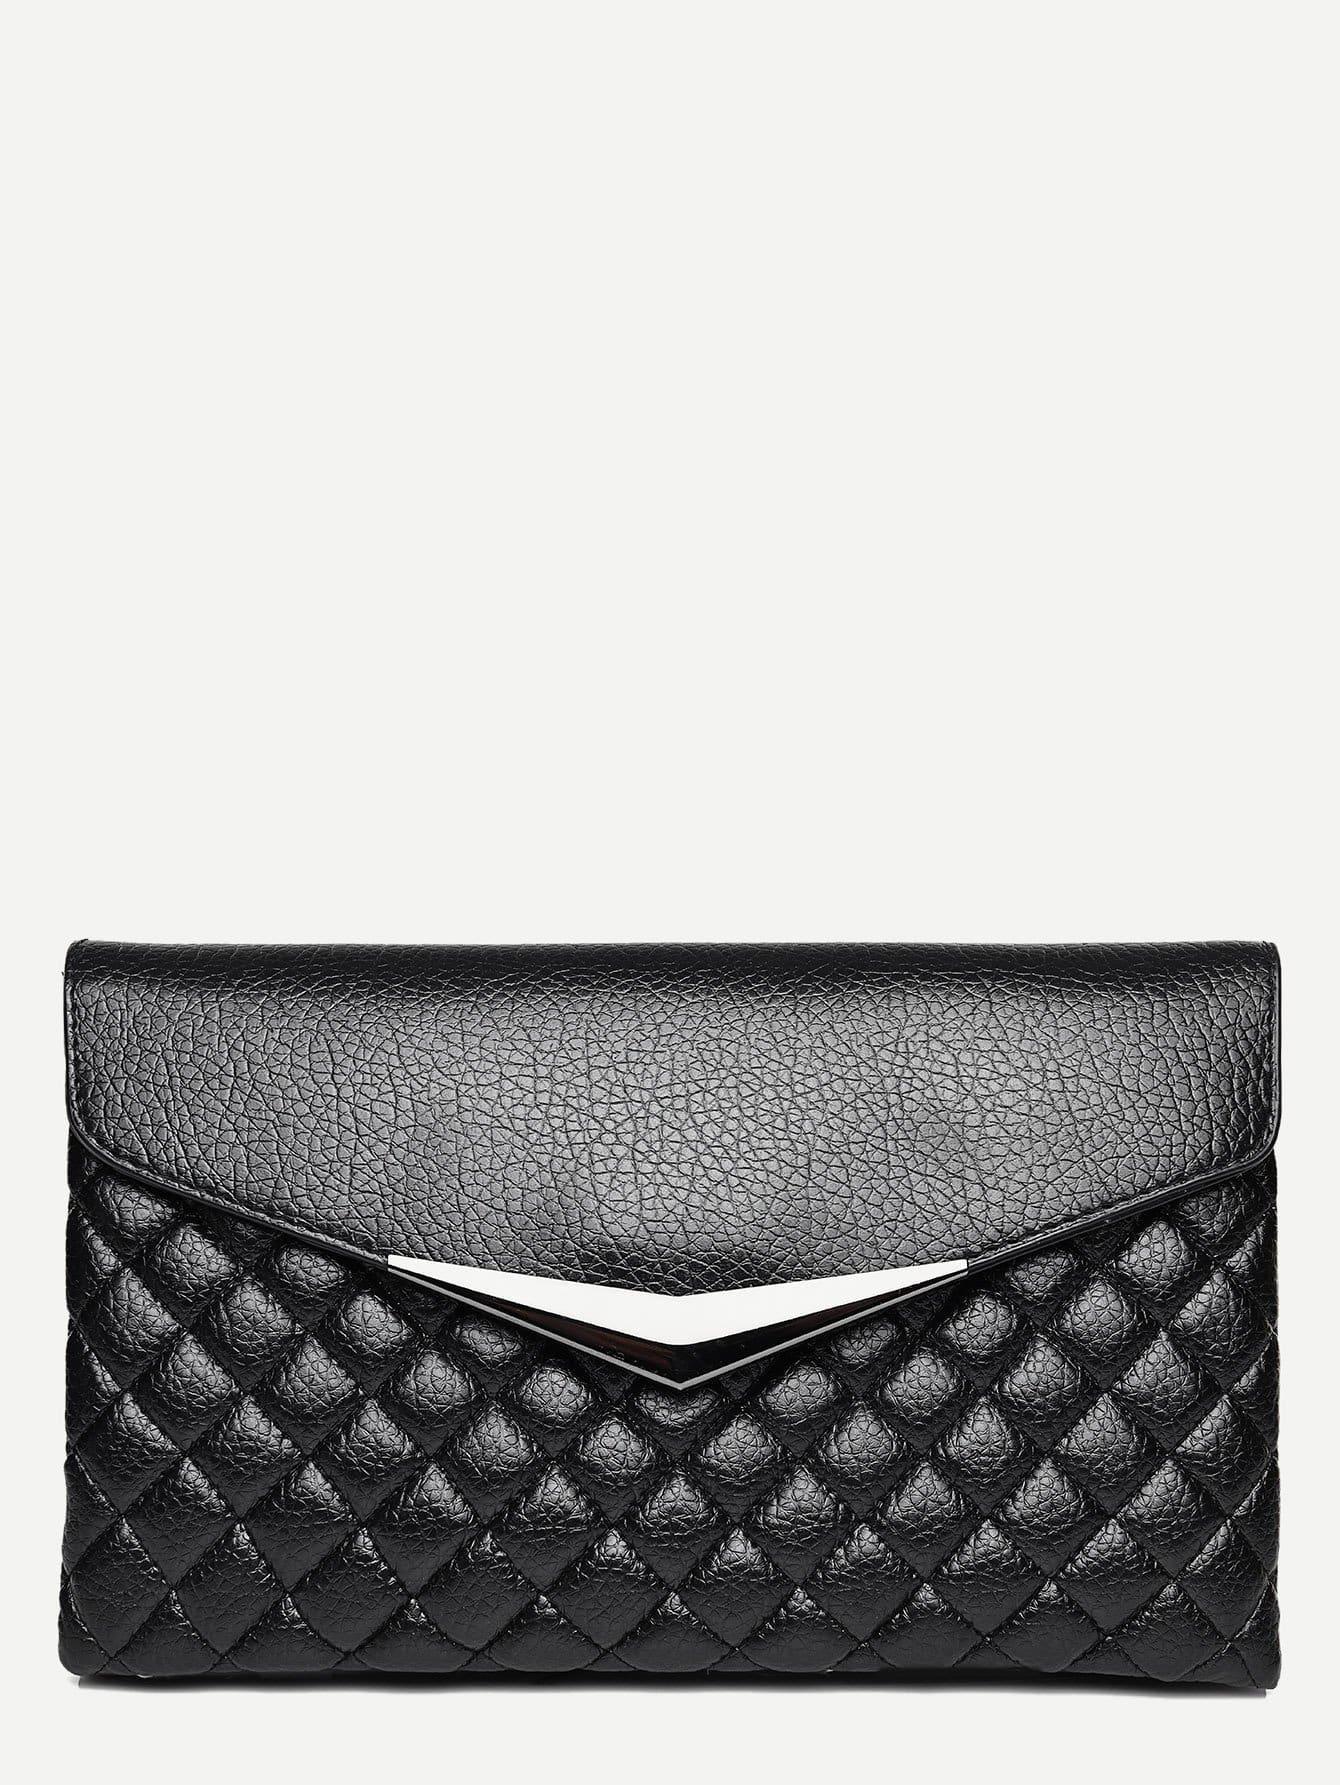 Quilted Detail PU Shoulder Bag With Ring Handle все цены